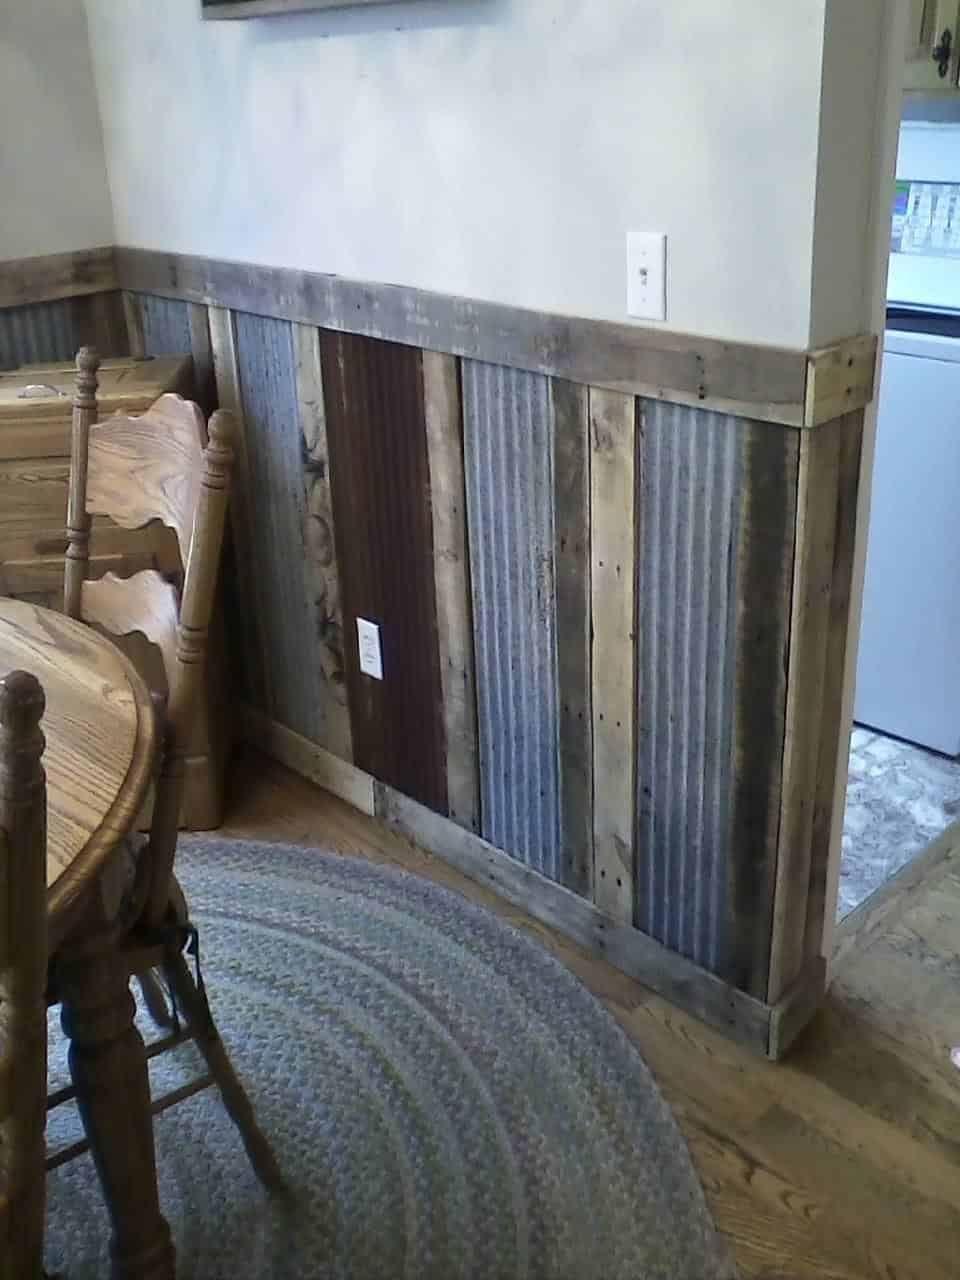 Pallets Plus Tin Makes Stunning Wainscoting! | Wood ...